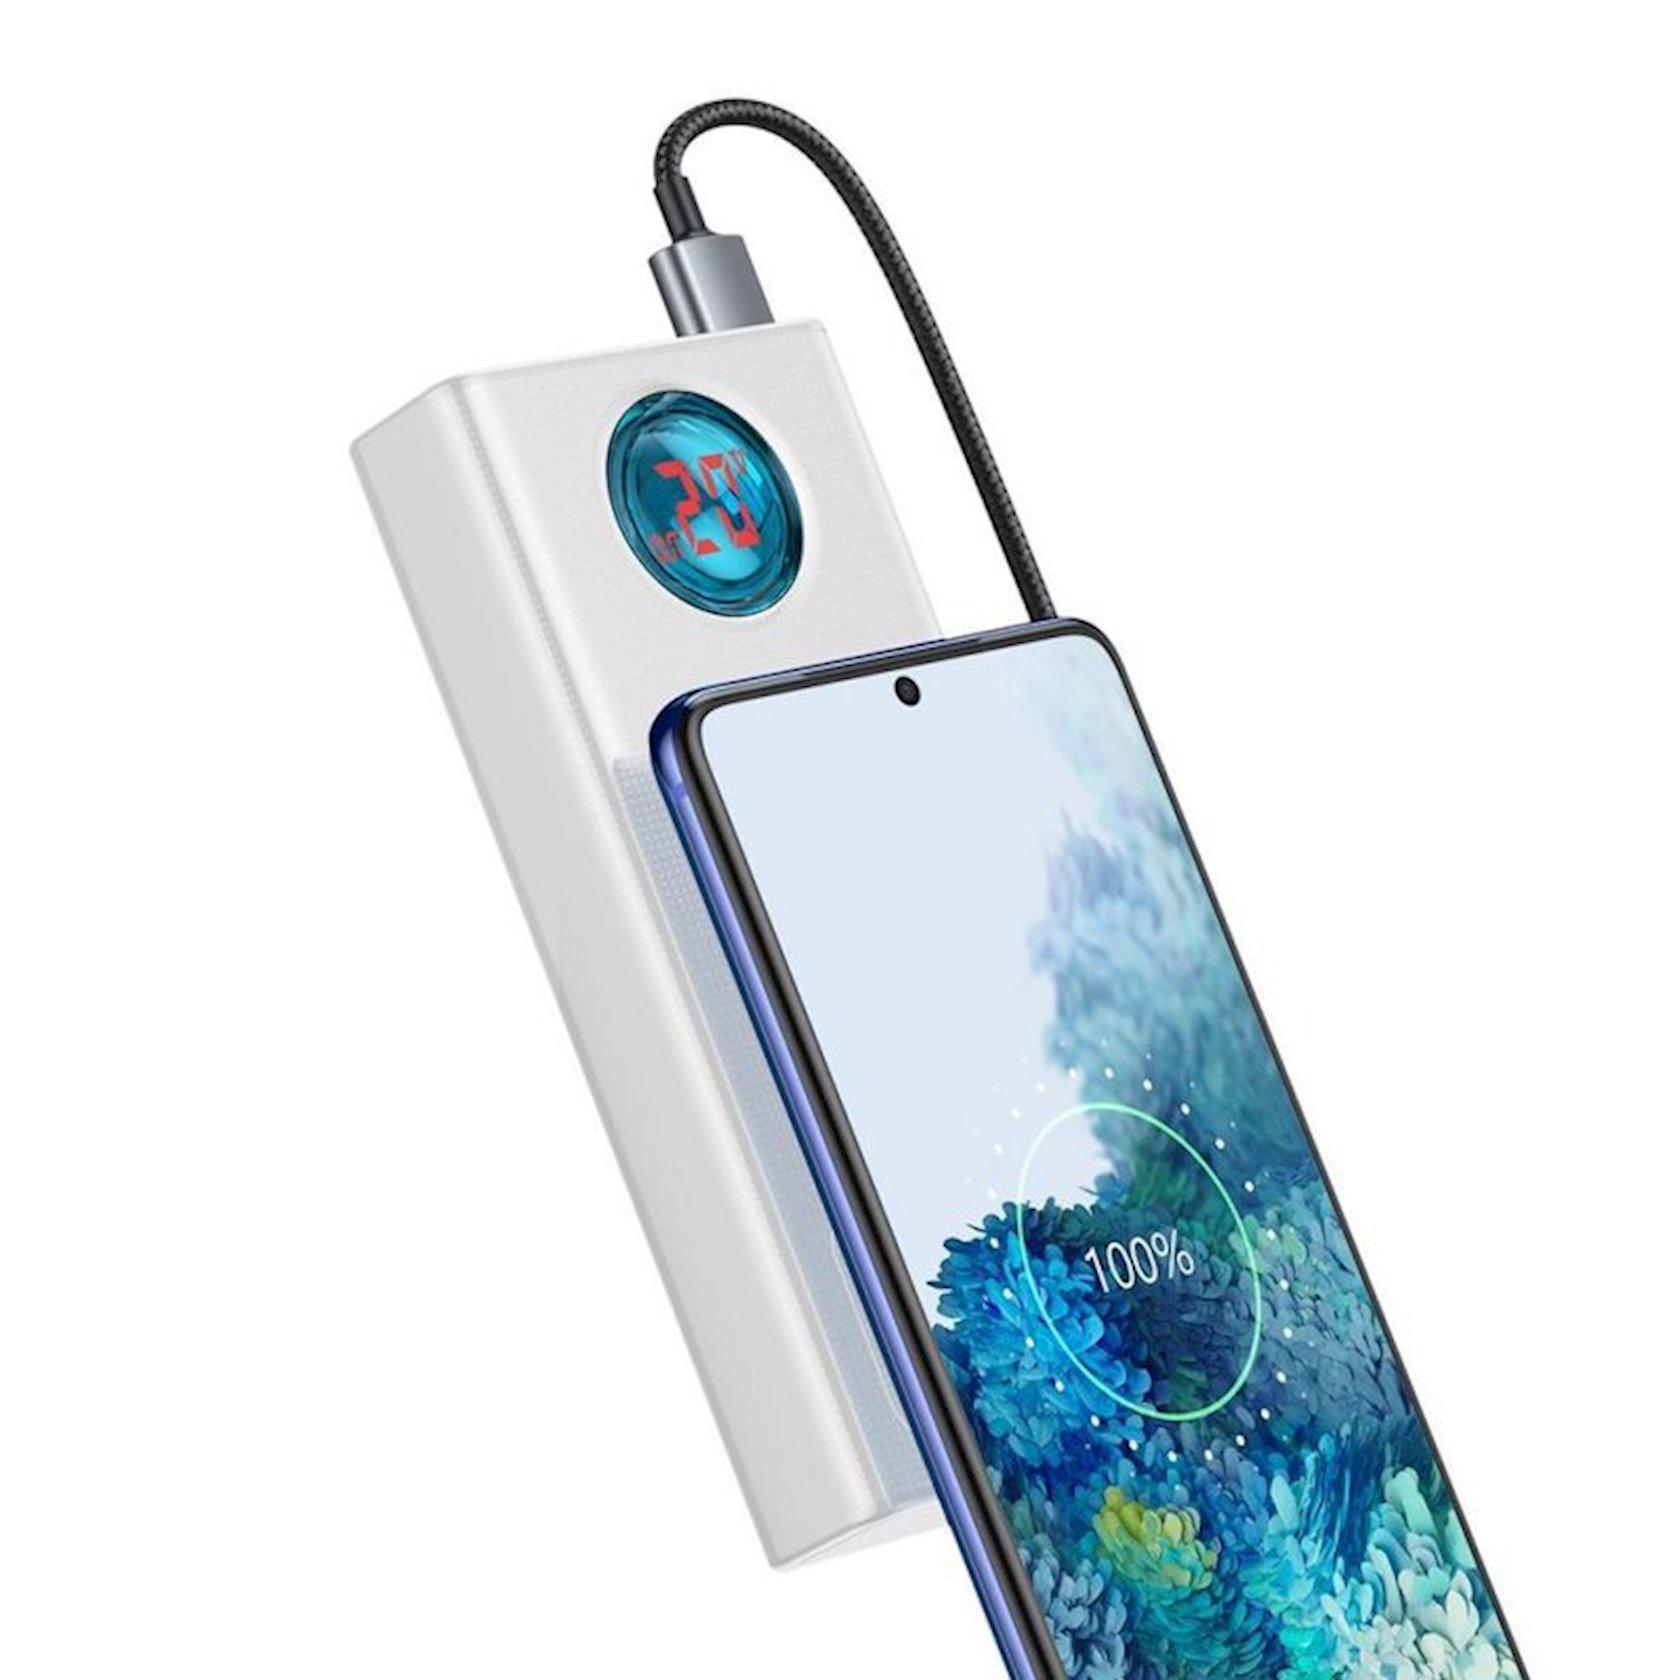 PowerbankBaseus Amblight Digital Display Quick Charge Power Bank 30000mAh White